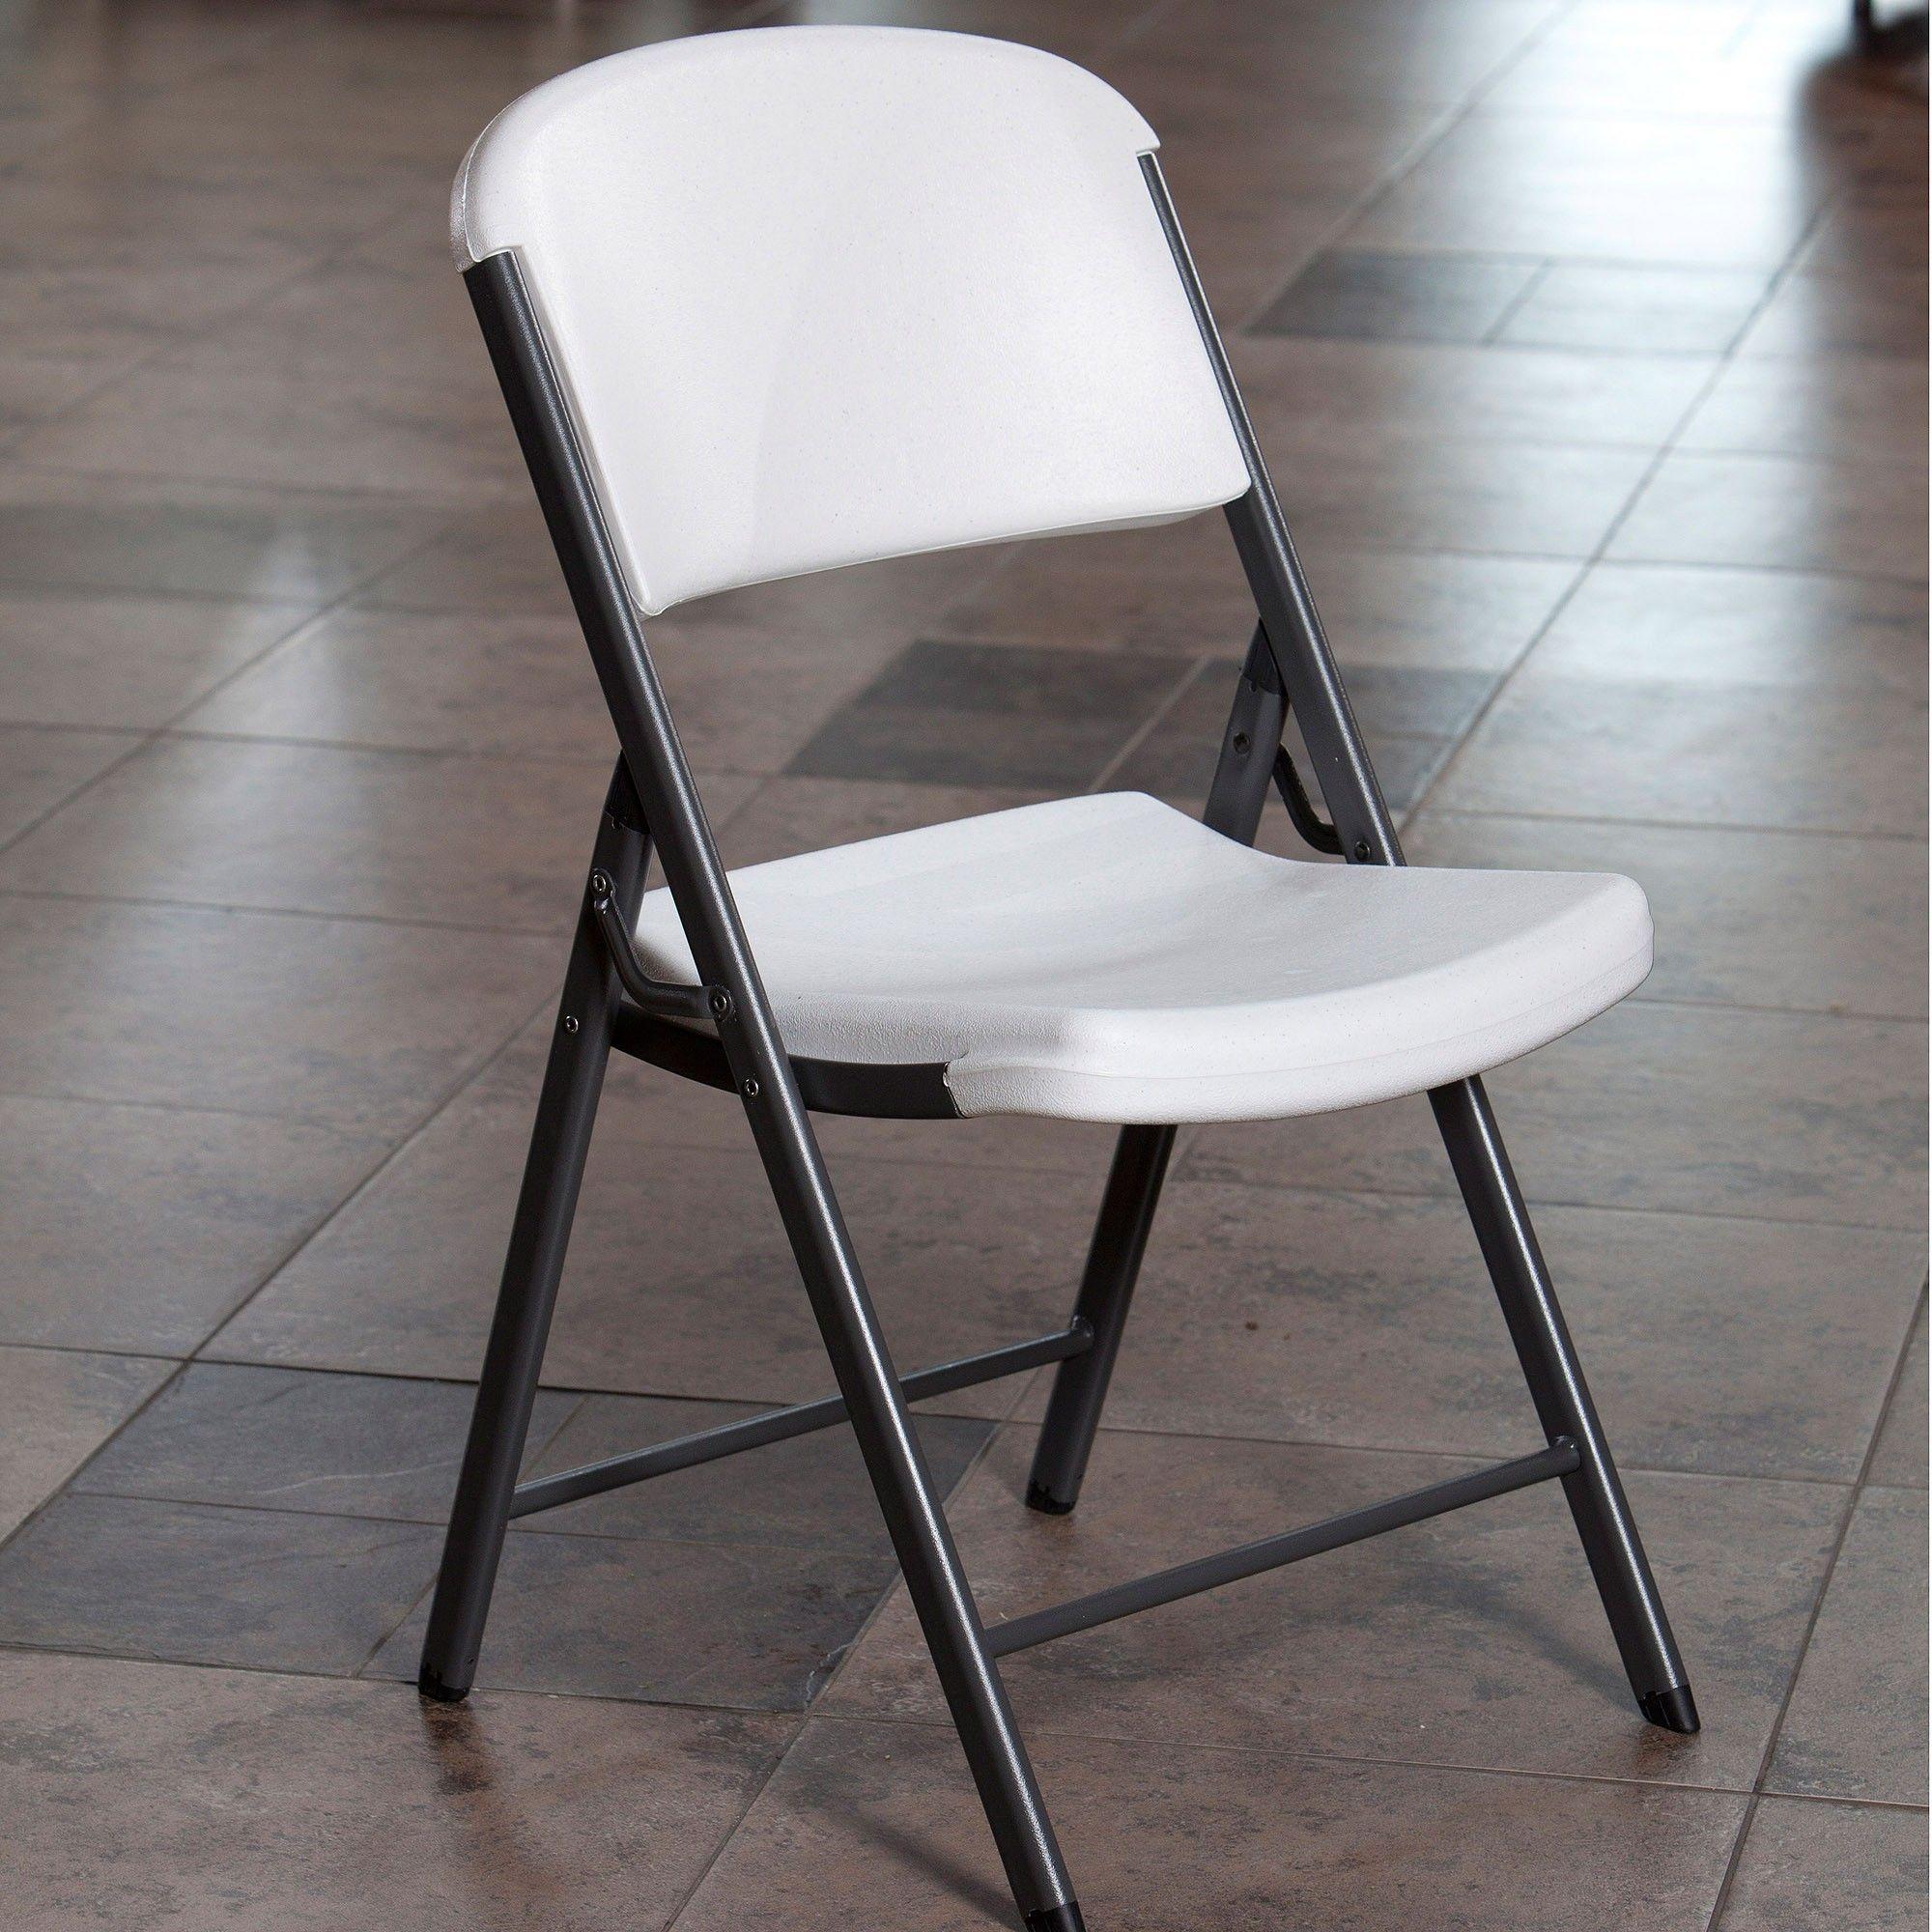 Beautiful Menards Folding Chairs Folding Lawn Chairs At Menards